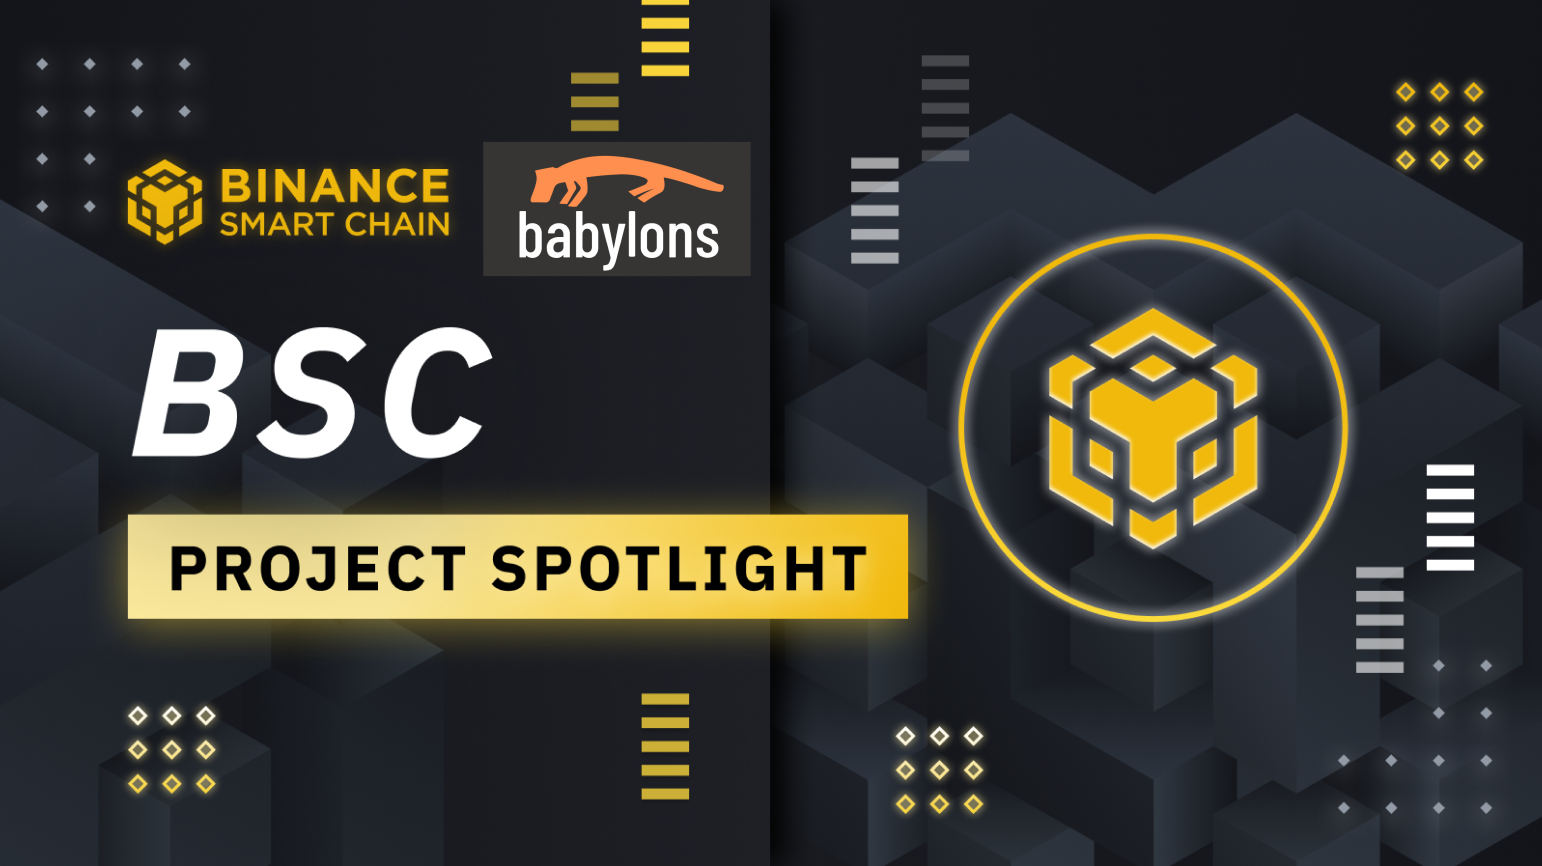 BSC Project Spotlight: Babylons